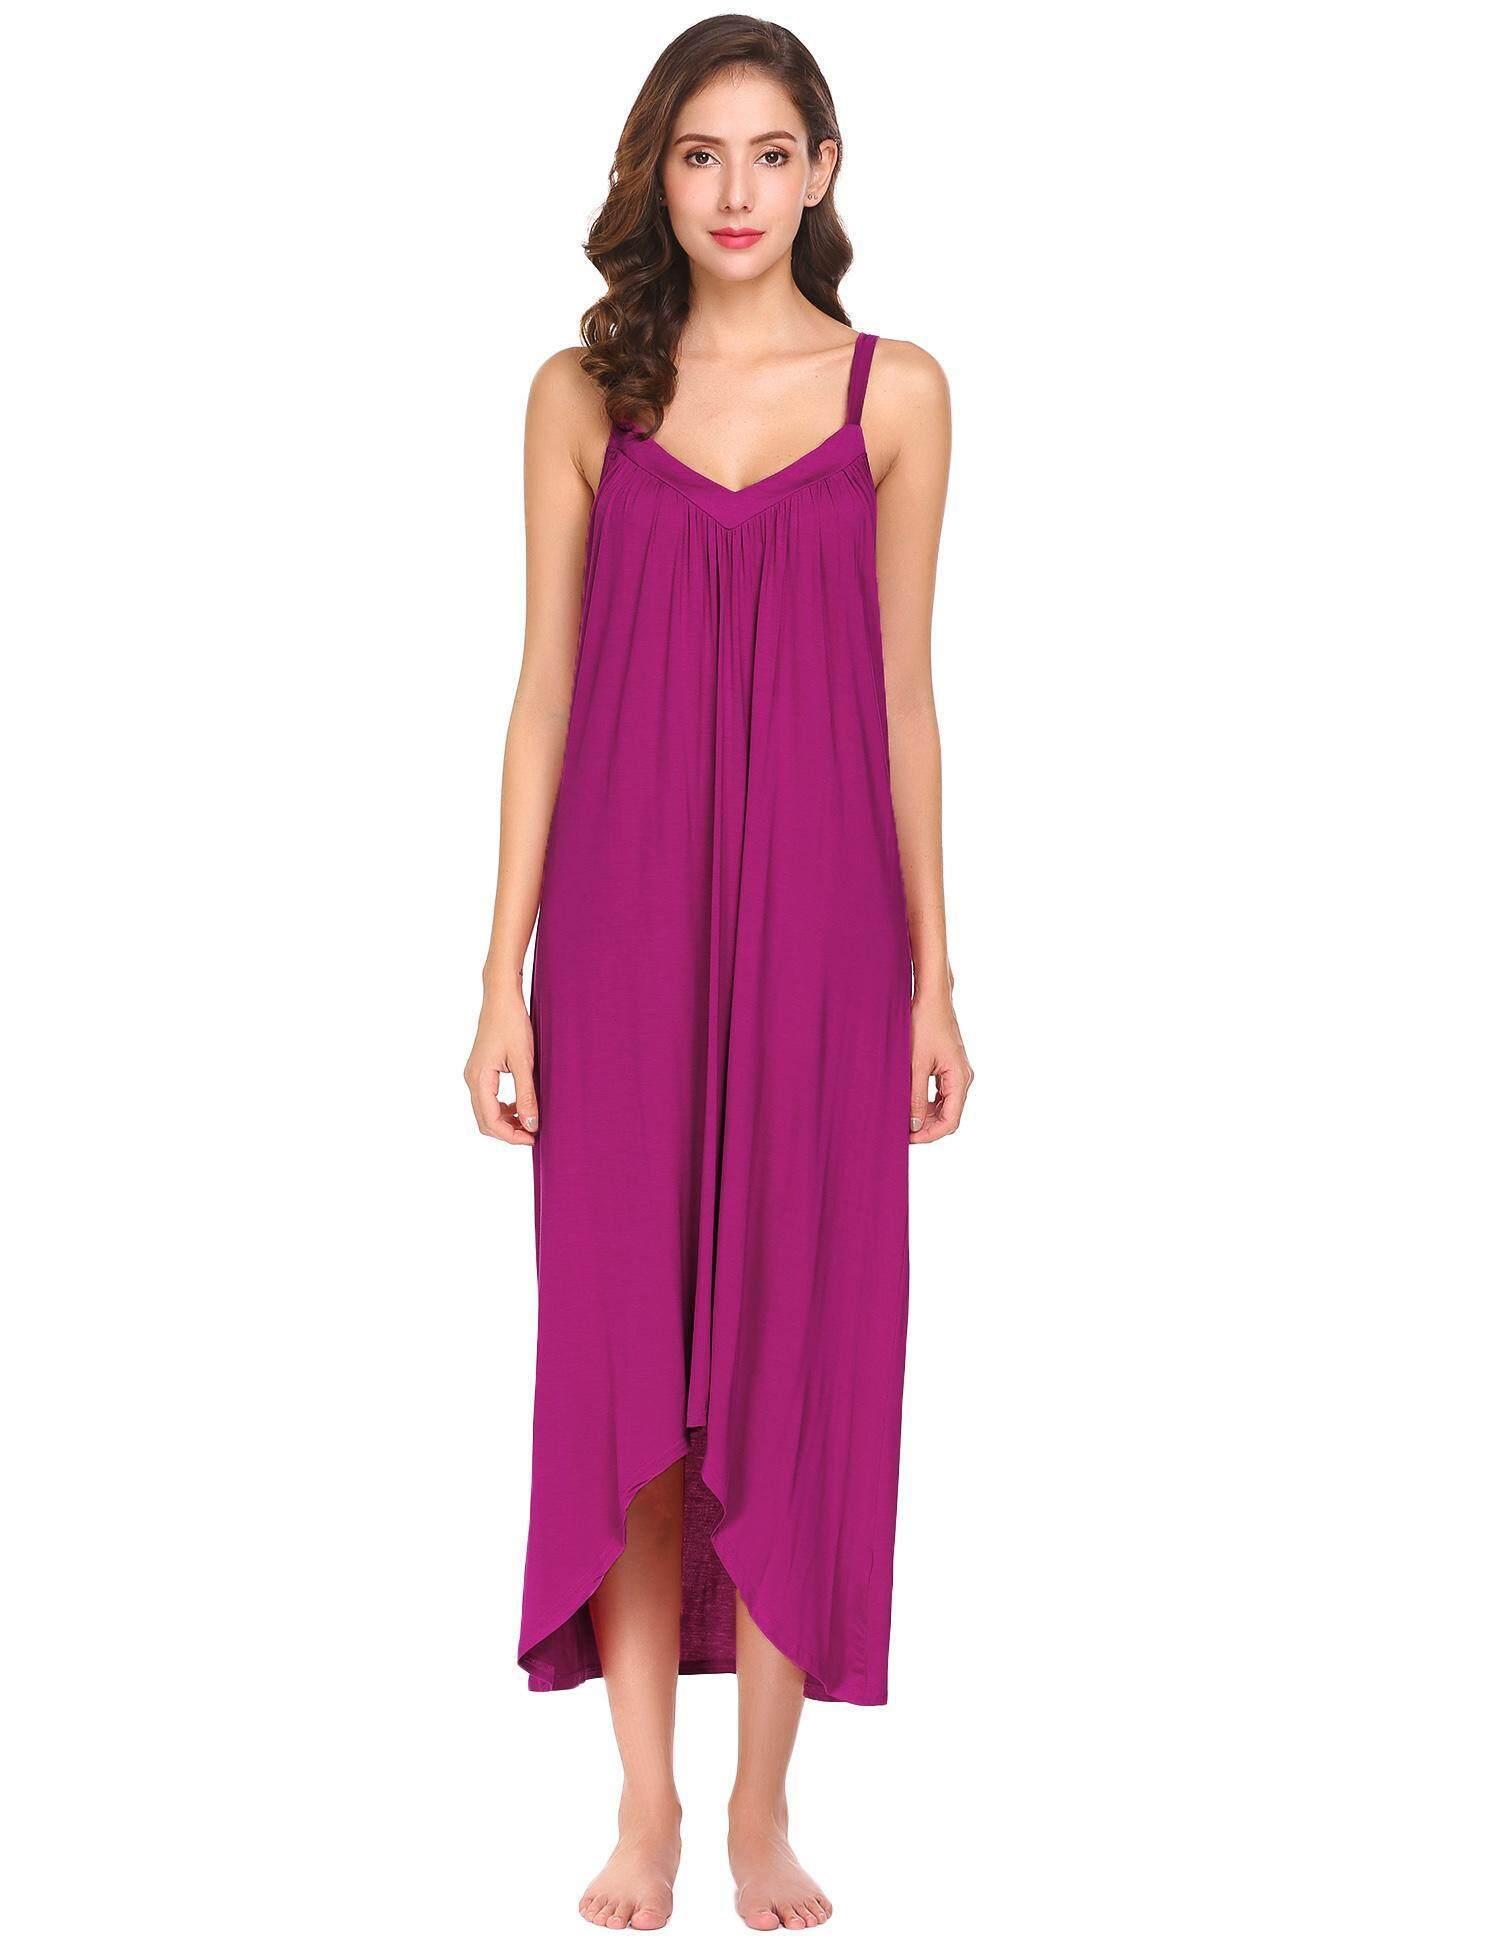 77ede798a785 Best Seller Sunweb Women V-Neck Spaghetti Strap Irregular Hem Solid Sleep  Dress(Black